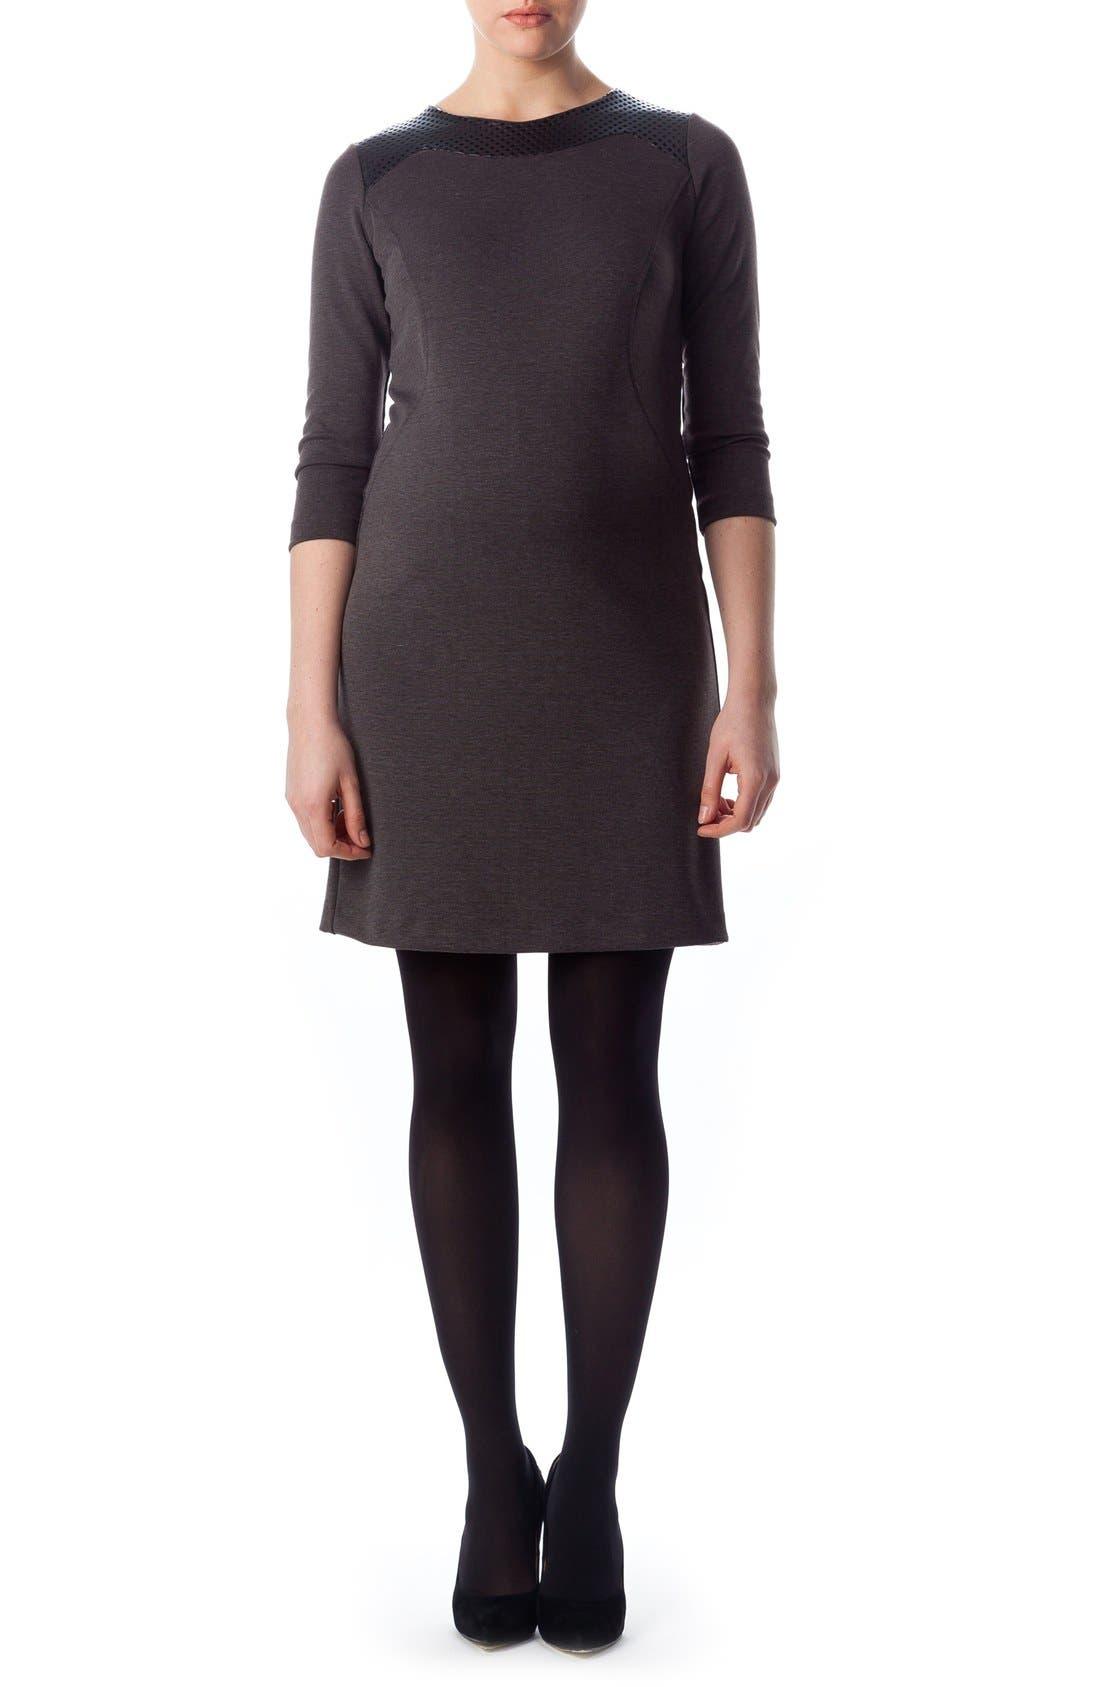 Milano Ponte Dress,                             Main thumbnail 1, color,                             Dark Grey Melange/ Black